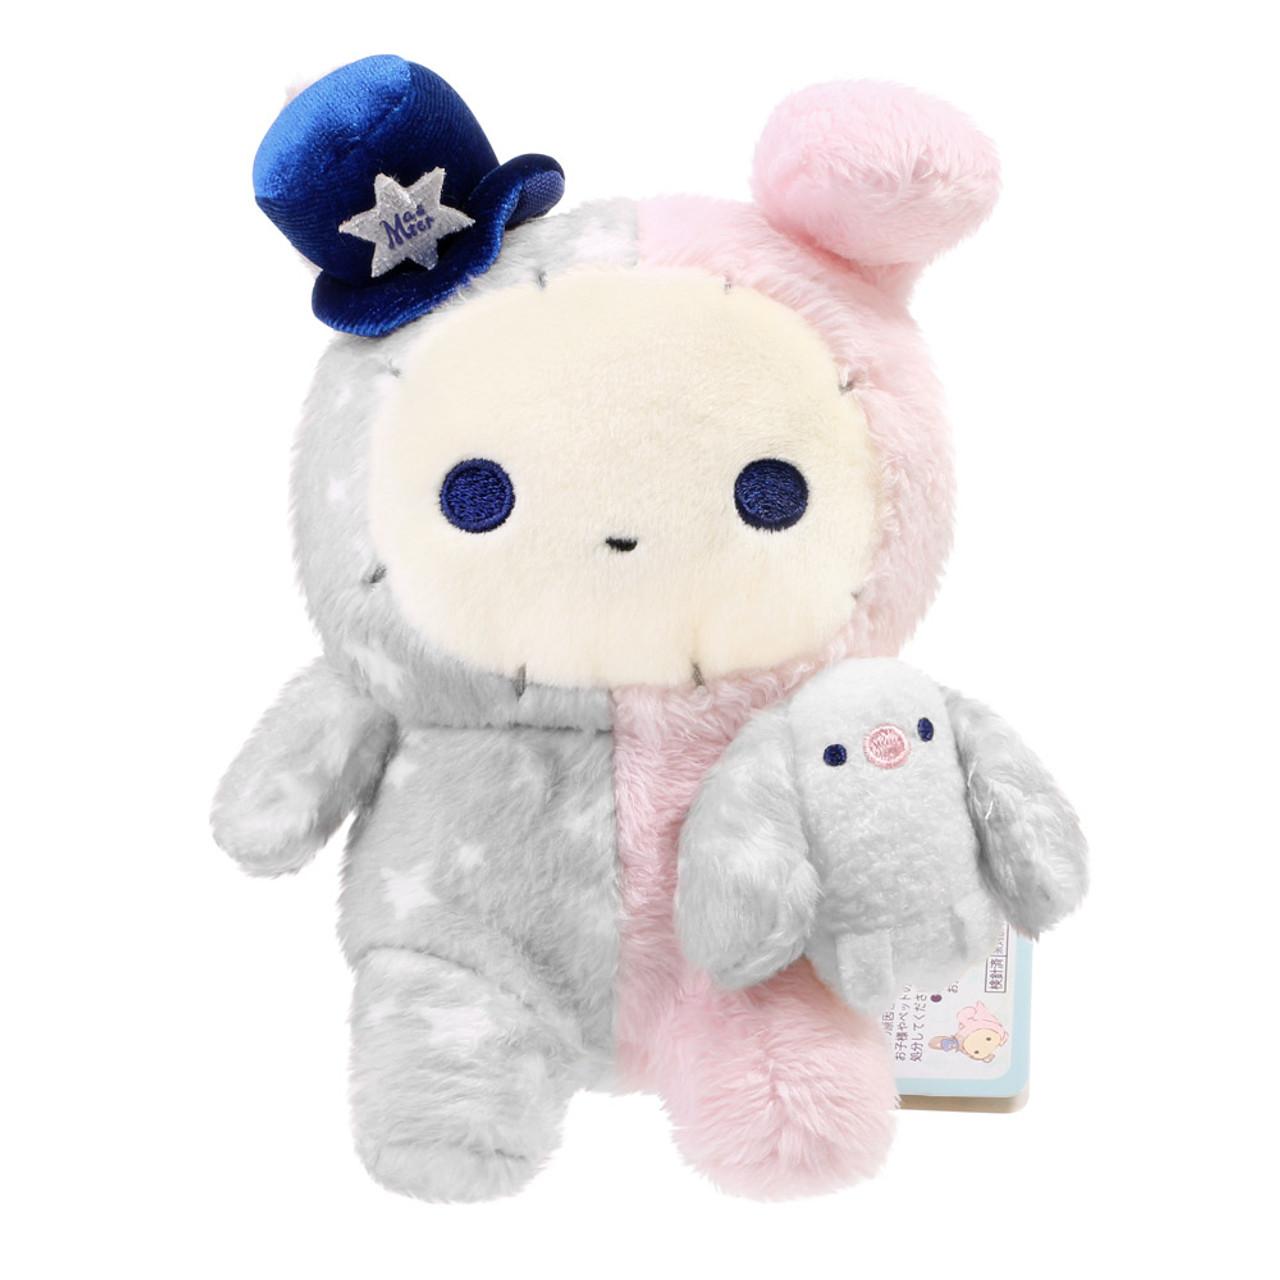 Sentimental Circus Plush Doll - Spica & PoPo ( Front View )